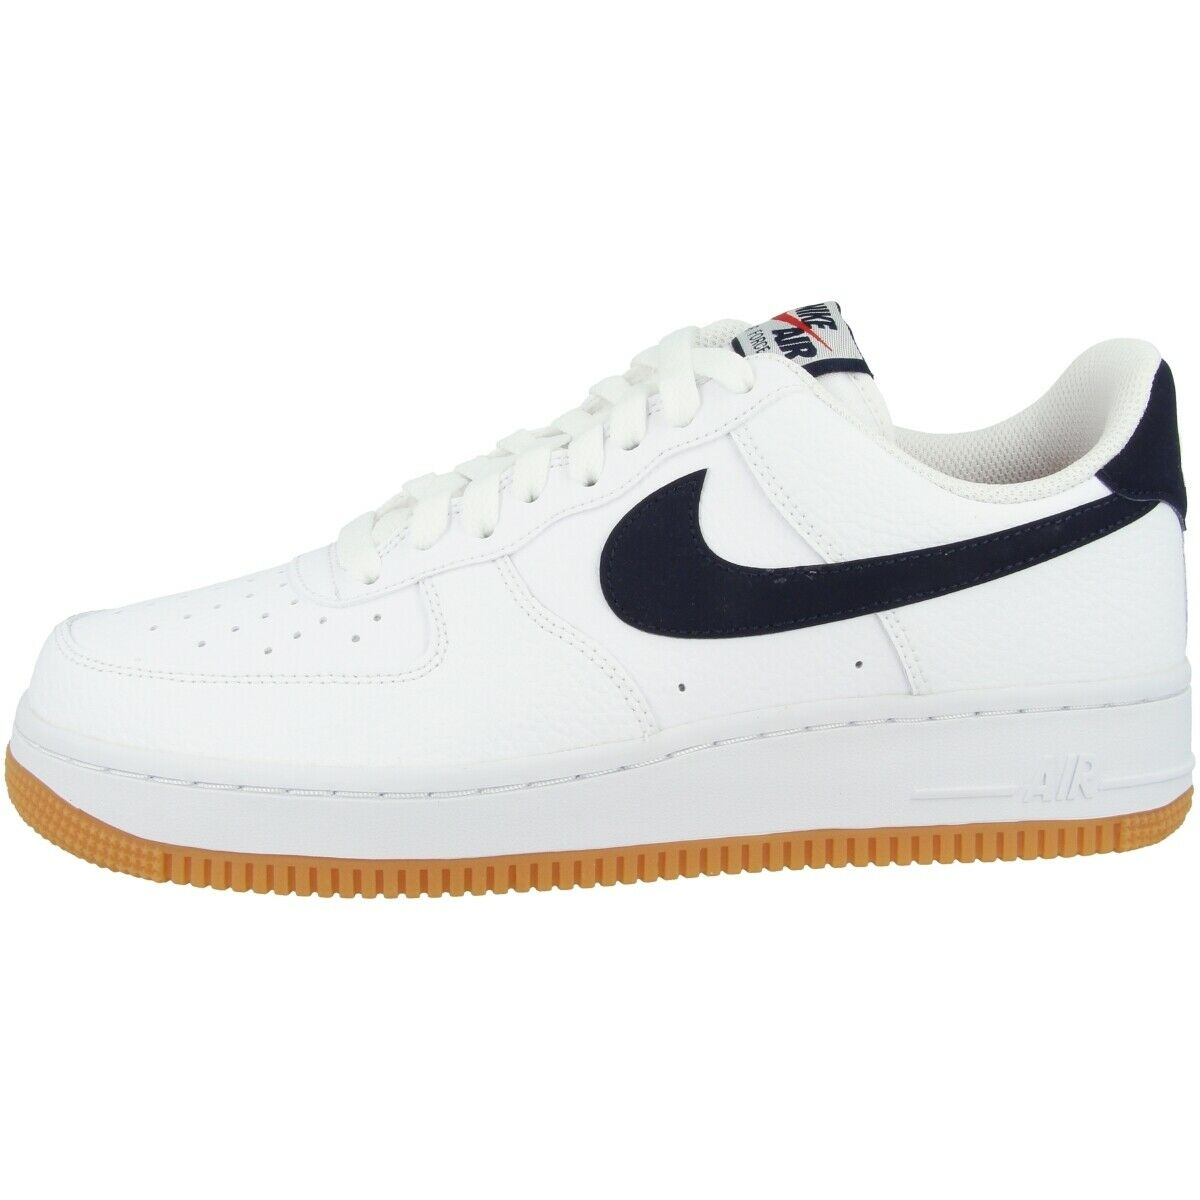 Nike Air Force 1 '07 2 Schuhe Low Cut Turnschuhe Sport Turnschuhe Weiß CI0057-100